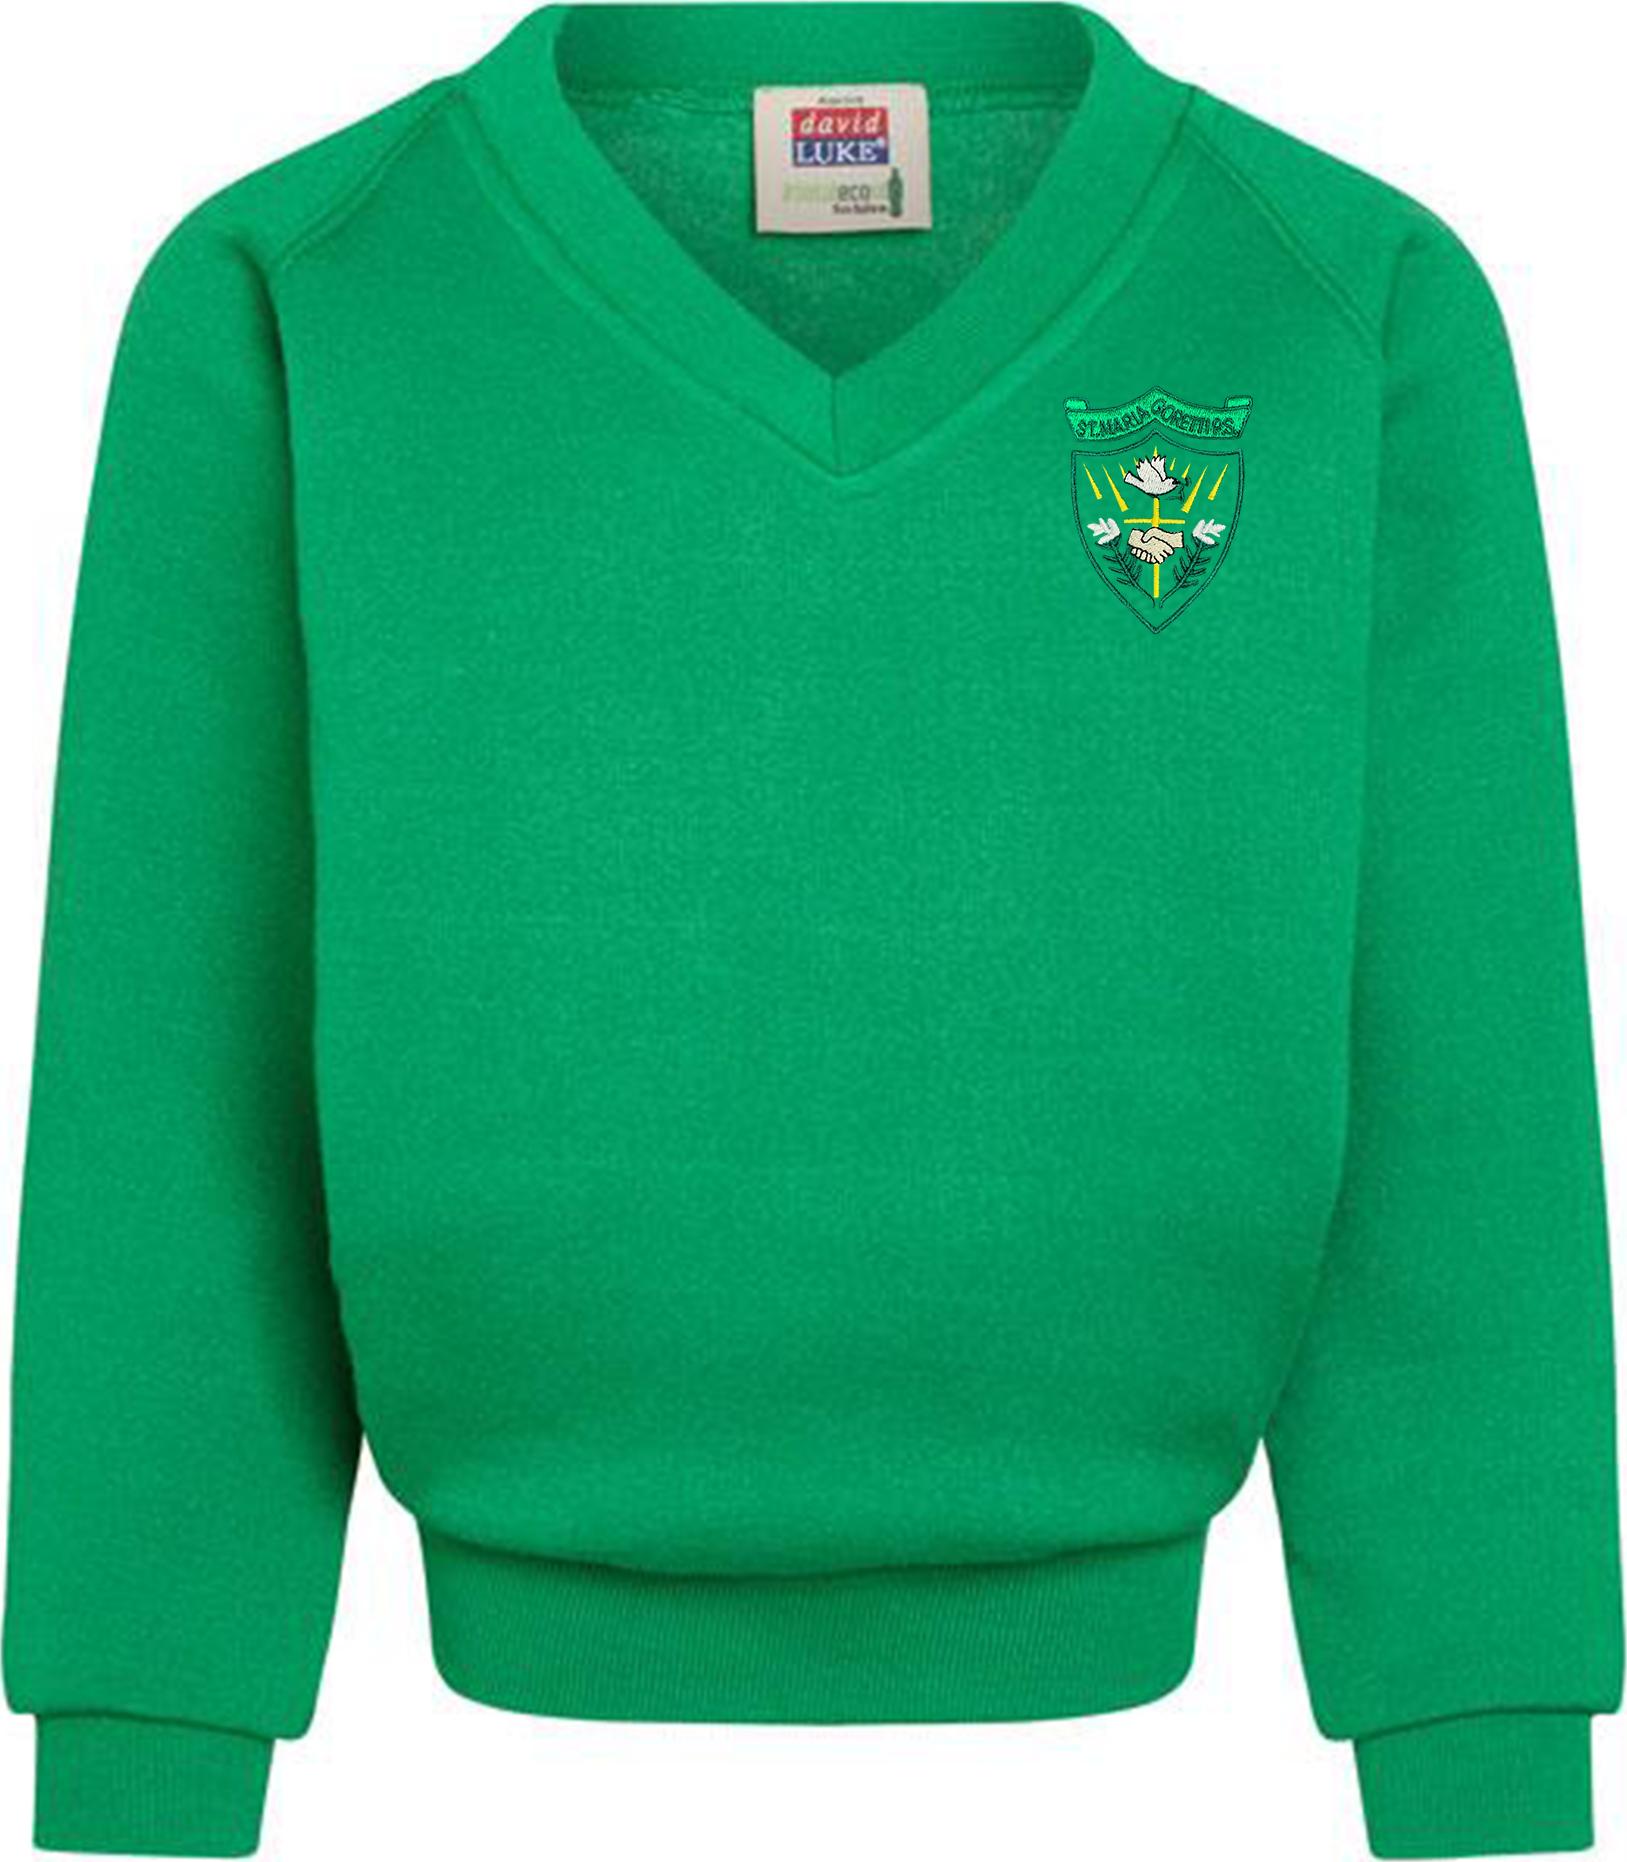 St. Maria Goretti Primary V Neck Sweatshirt